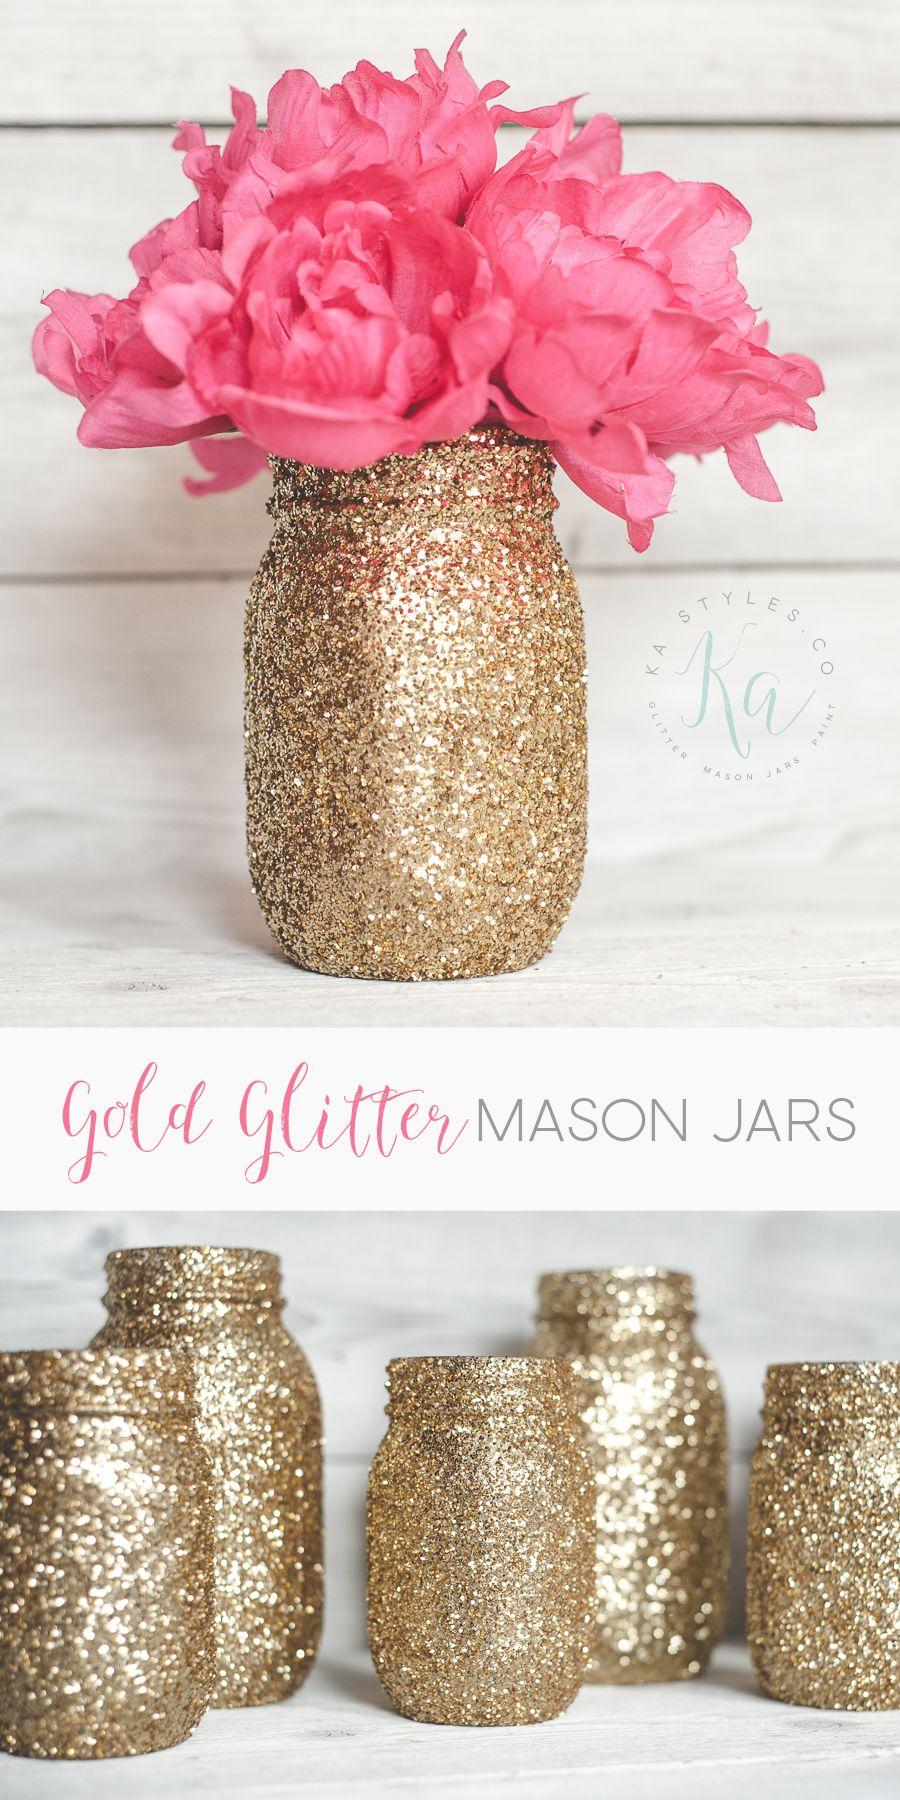 Gold Glitter Mason Jars #masonjardiy